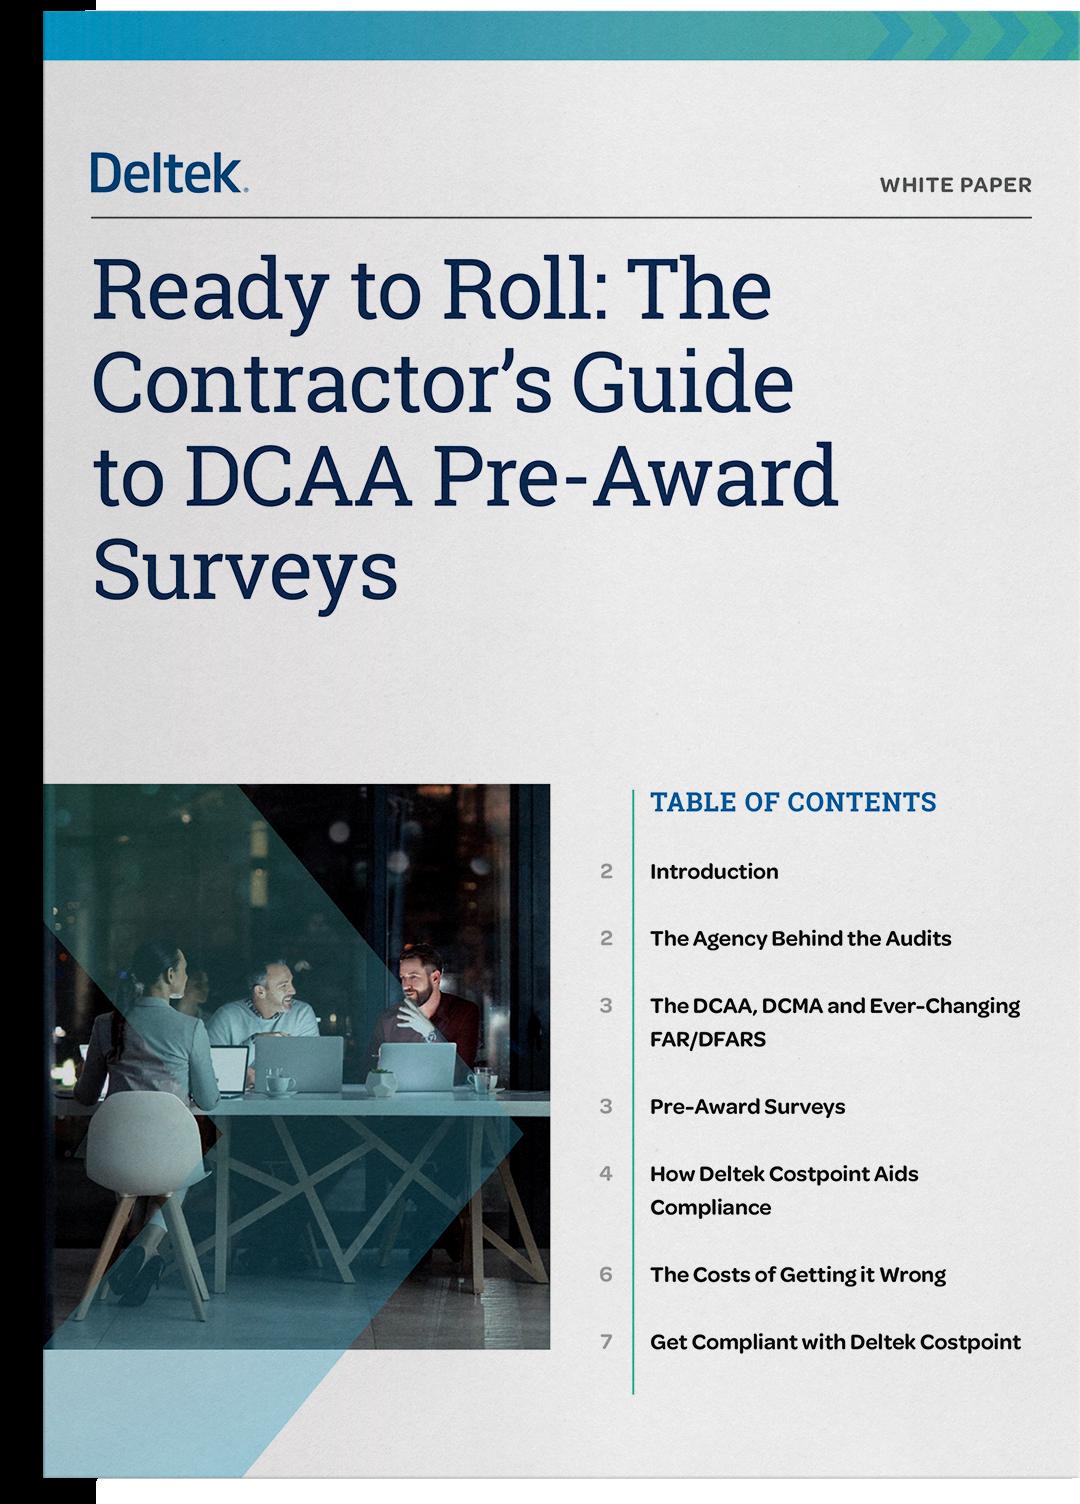 The Contractor's Guide to DCAA Pre-Award Survey